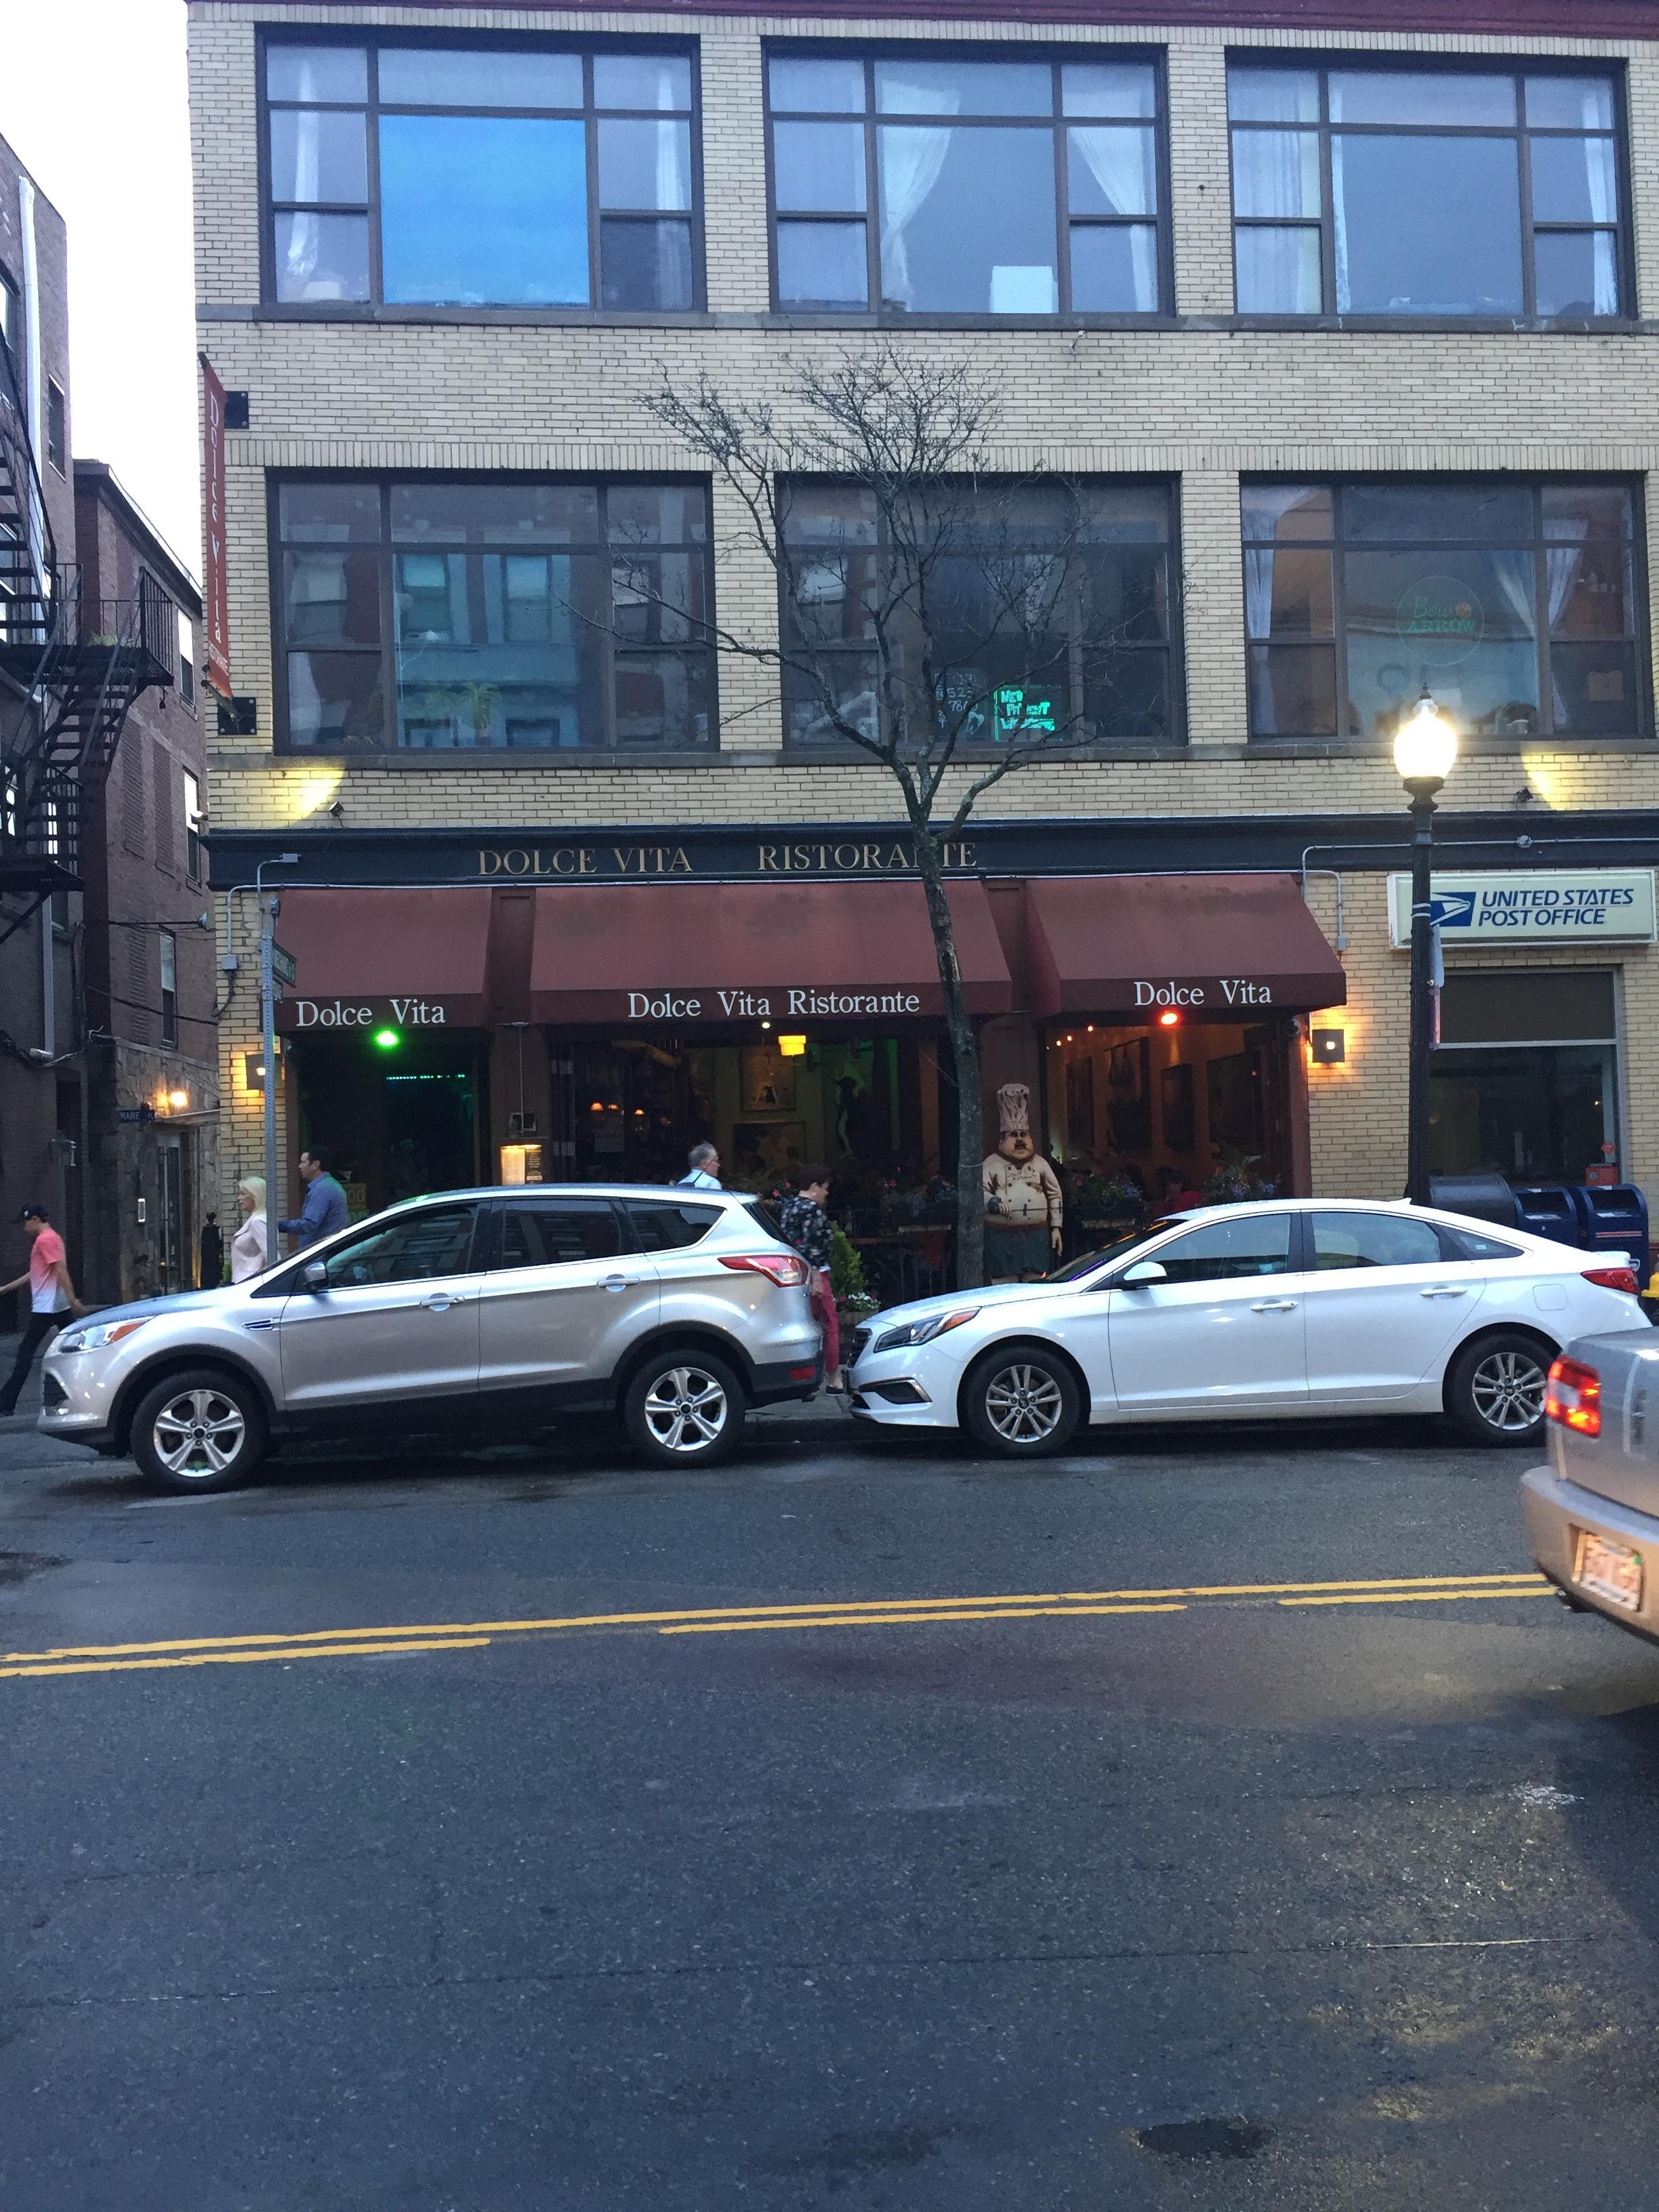 One of my favorite Italian restaurants in Boston. (North End)